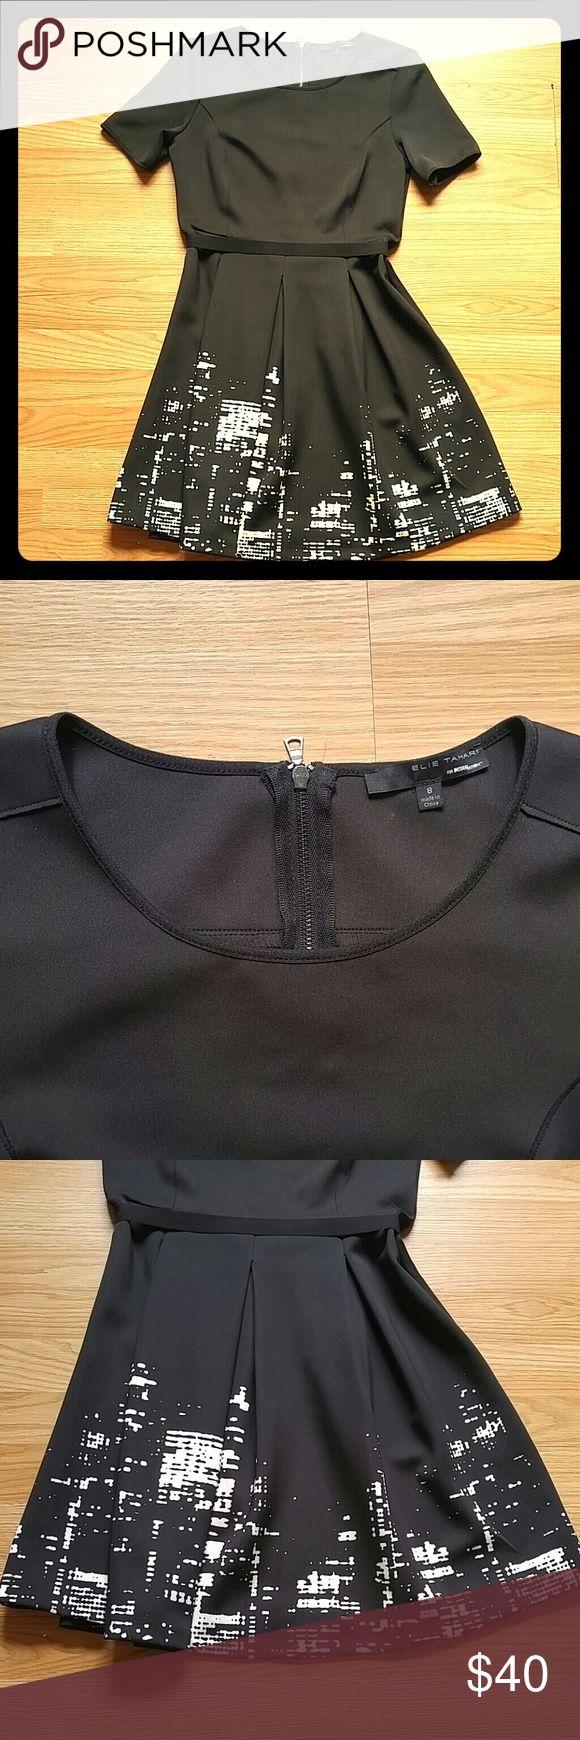 Elie Tahari for Design Nation Skyline Dress Black Elie Tahari dress with abstract city skyline design. Satin ribbon at waistline. Elie Tahari Dresses Midi